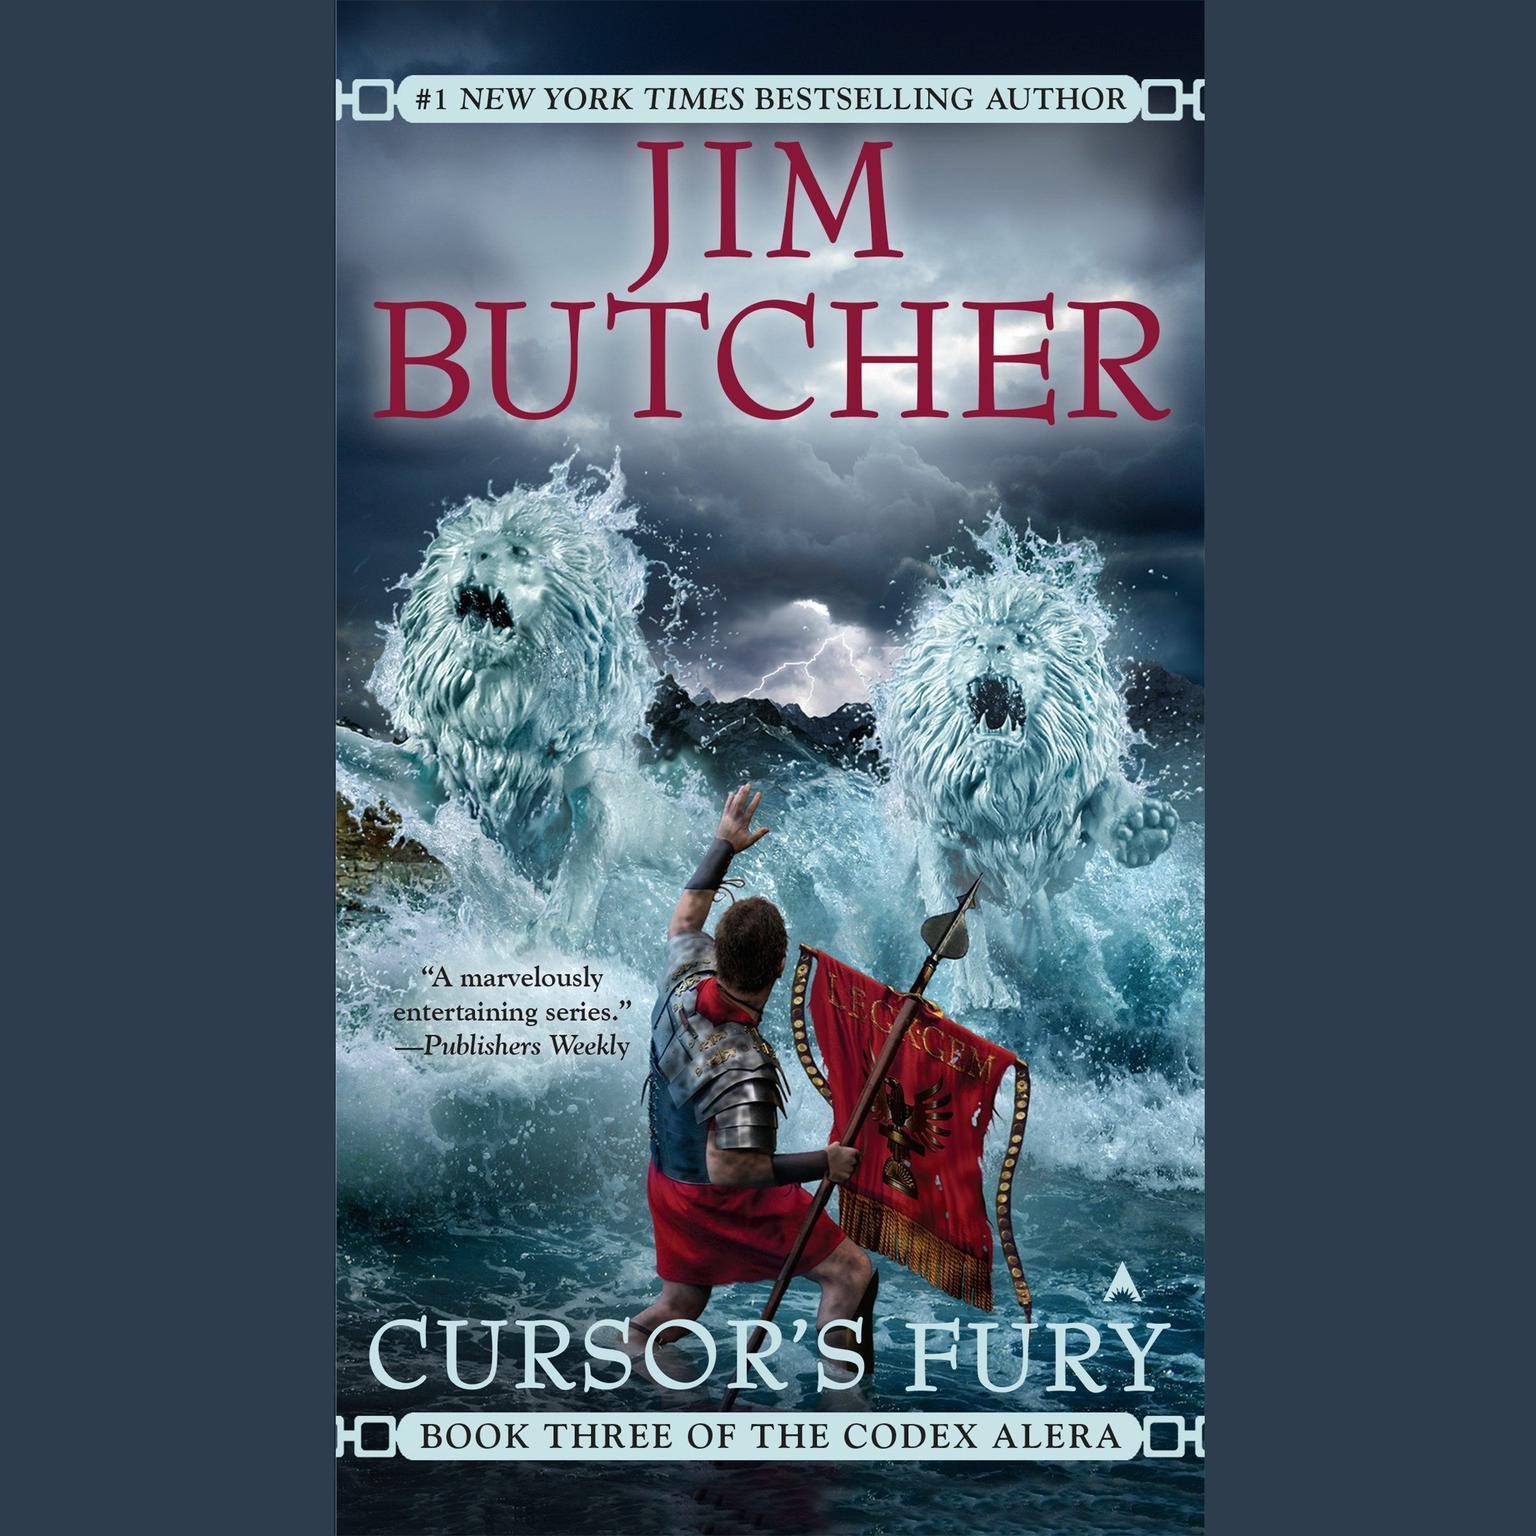 Printable Cursor's Fury: Book Three of the Codex Alera Audiobook Cover Art